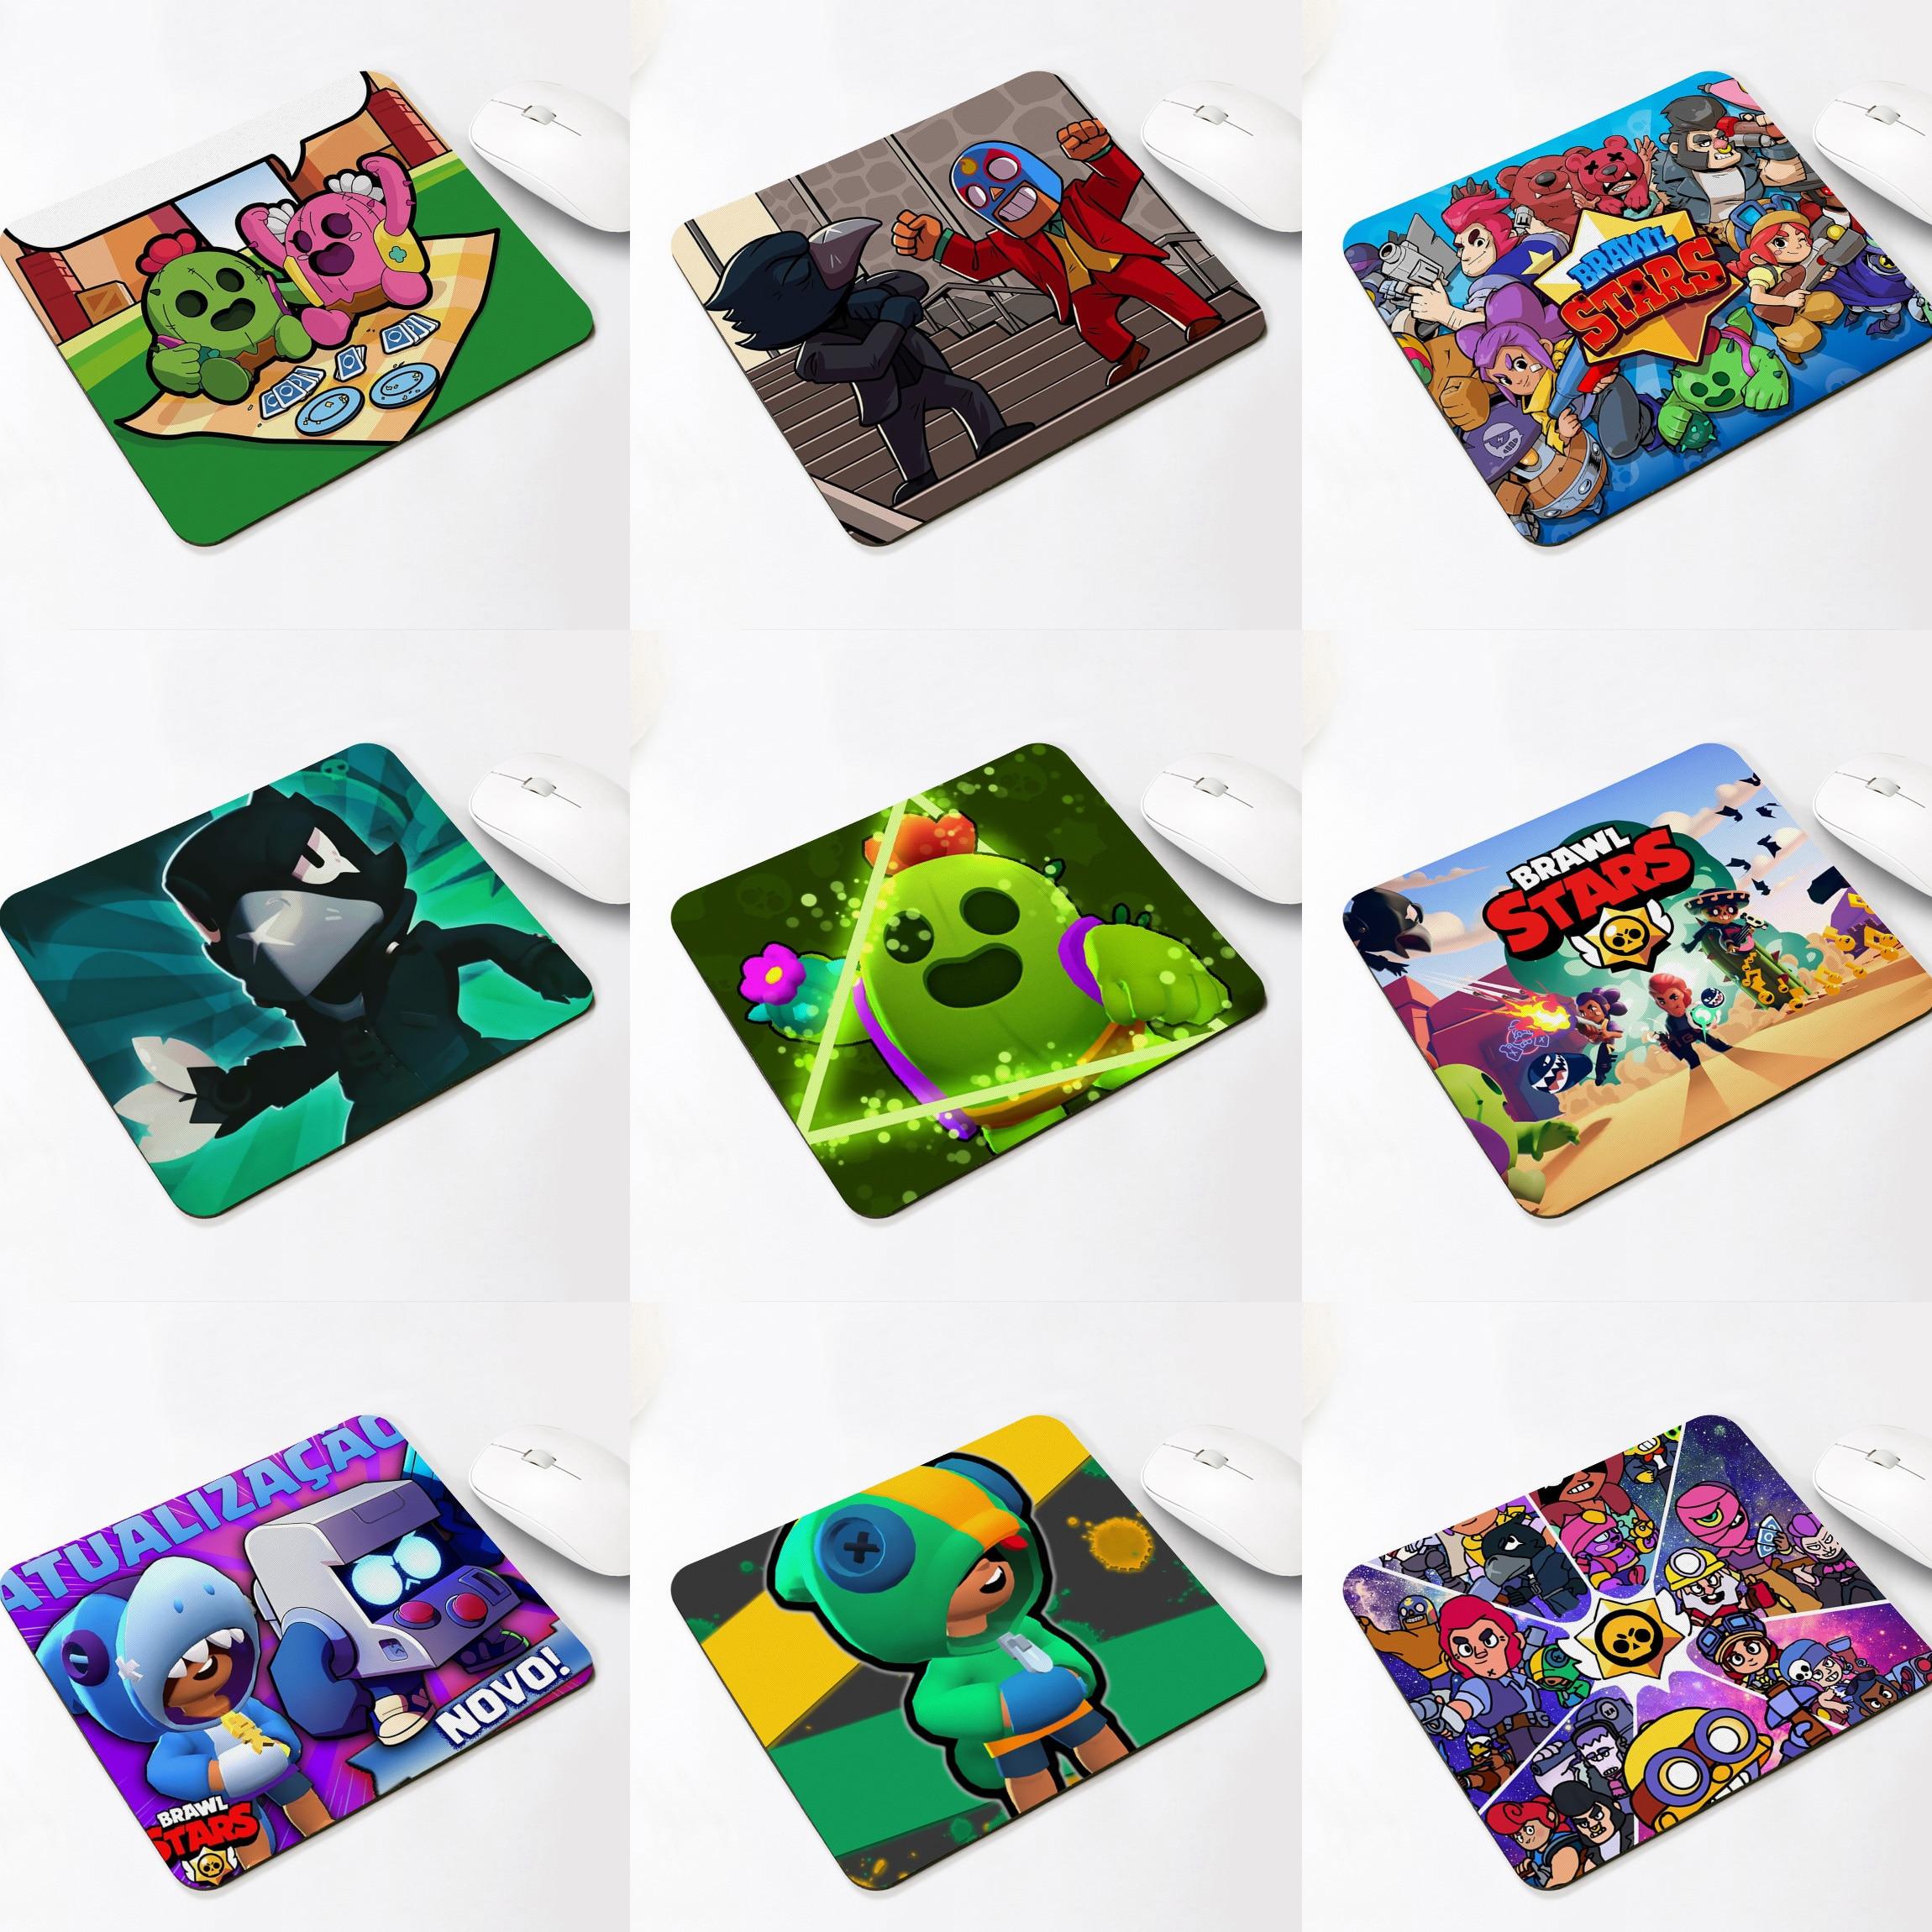 Brawling Game Hero Star Keyboard Mat Desk Mat Spike Shelly Leon Desktop Mousepad Rubber Professional Gaming Mouse Pad Toys